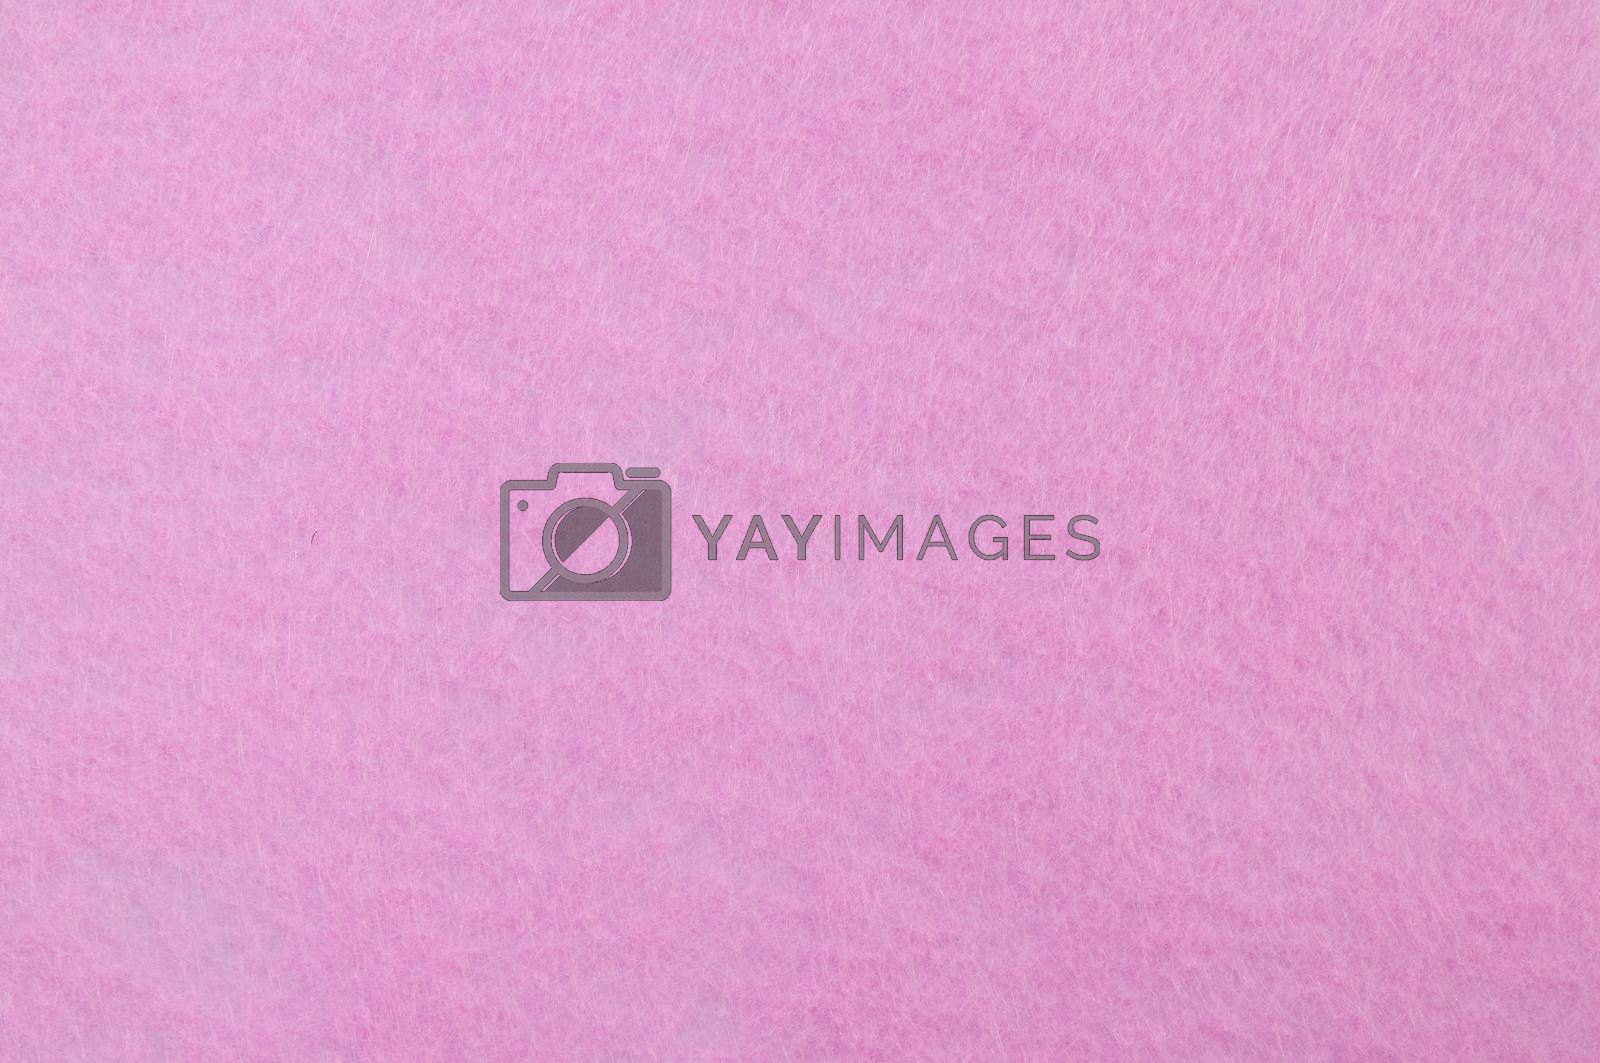 Texture background of Violet velvet or flannel as backdrop or wallpaper pattern for decoration